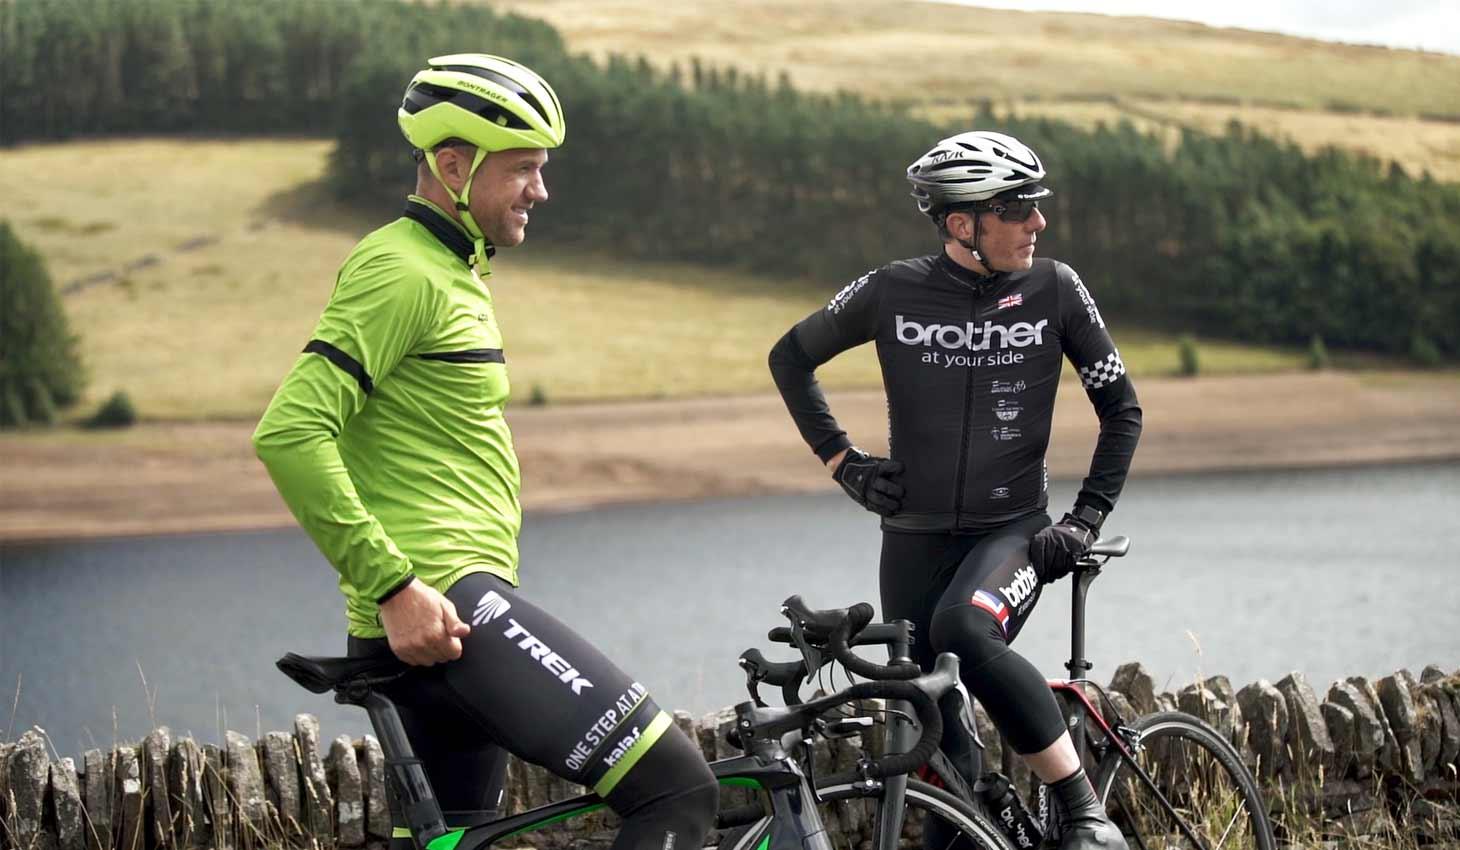 James Golding and Phil Jones on Bikes